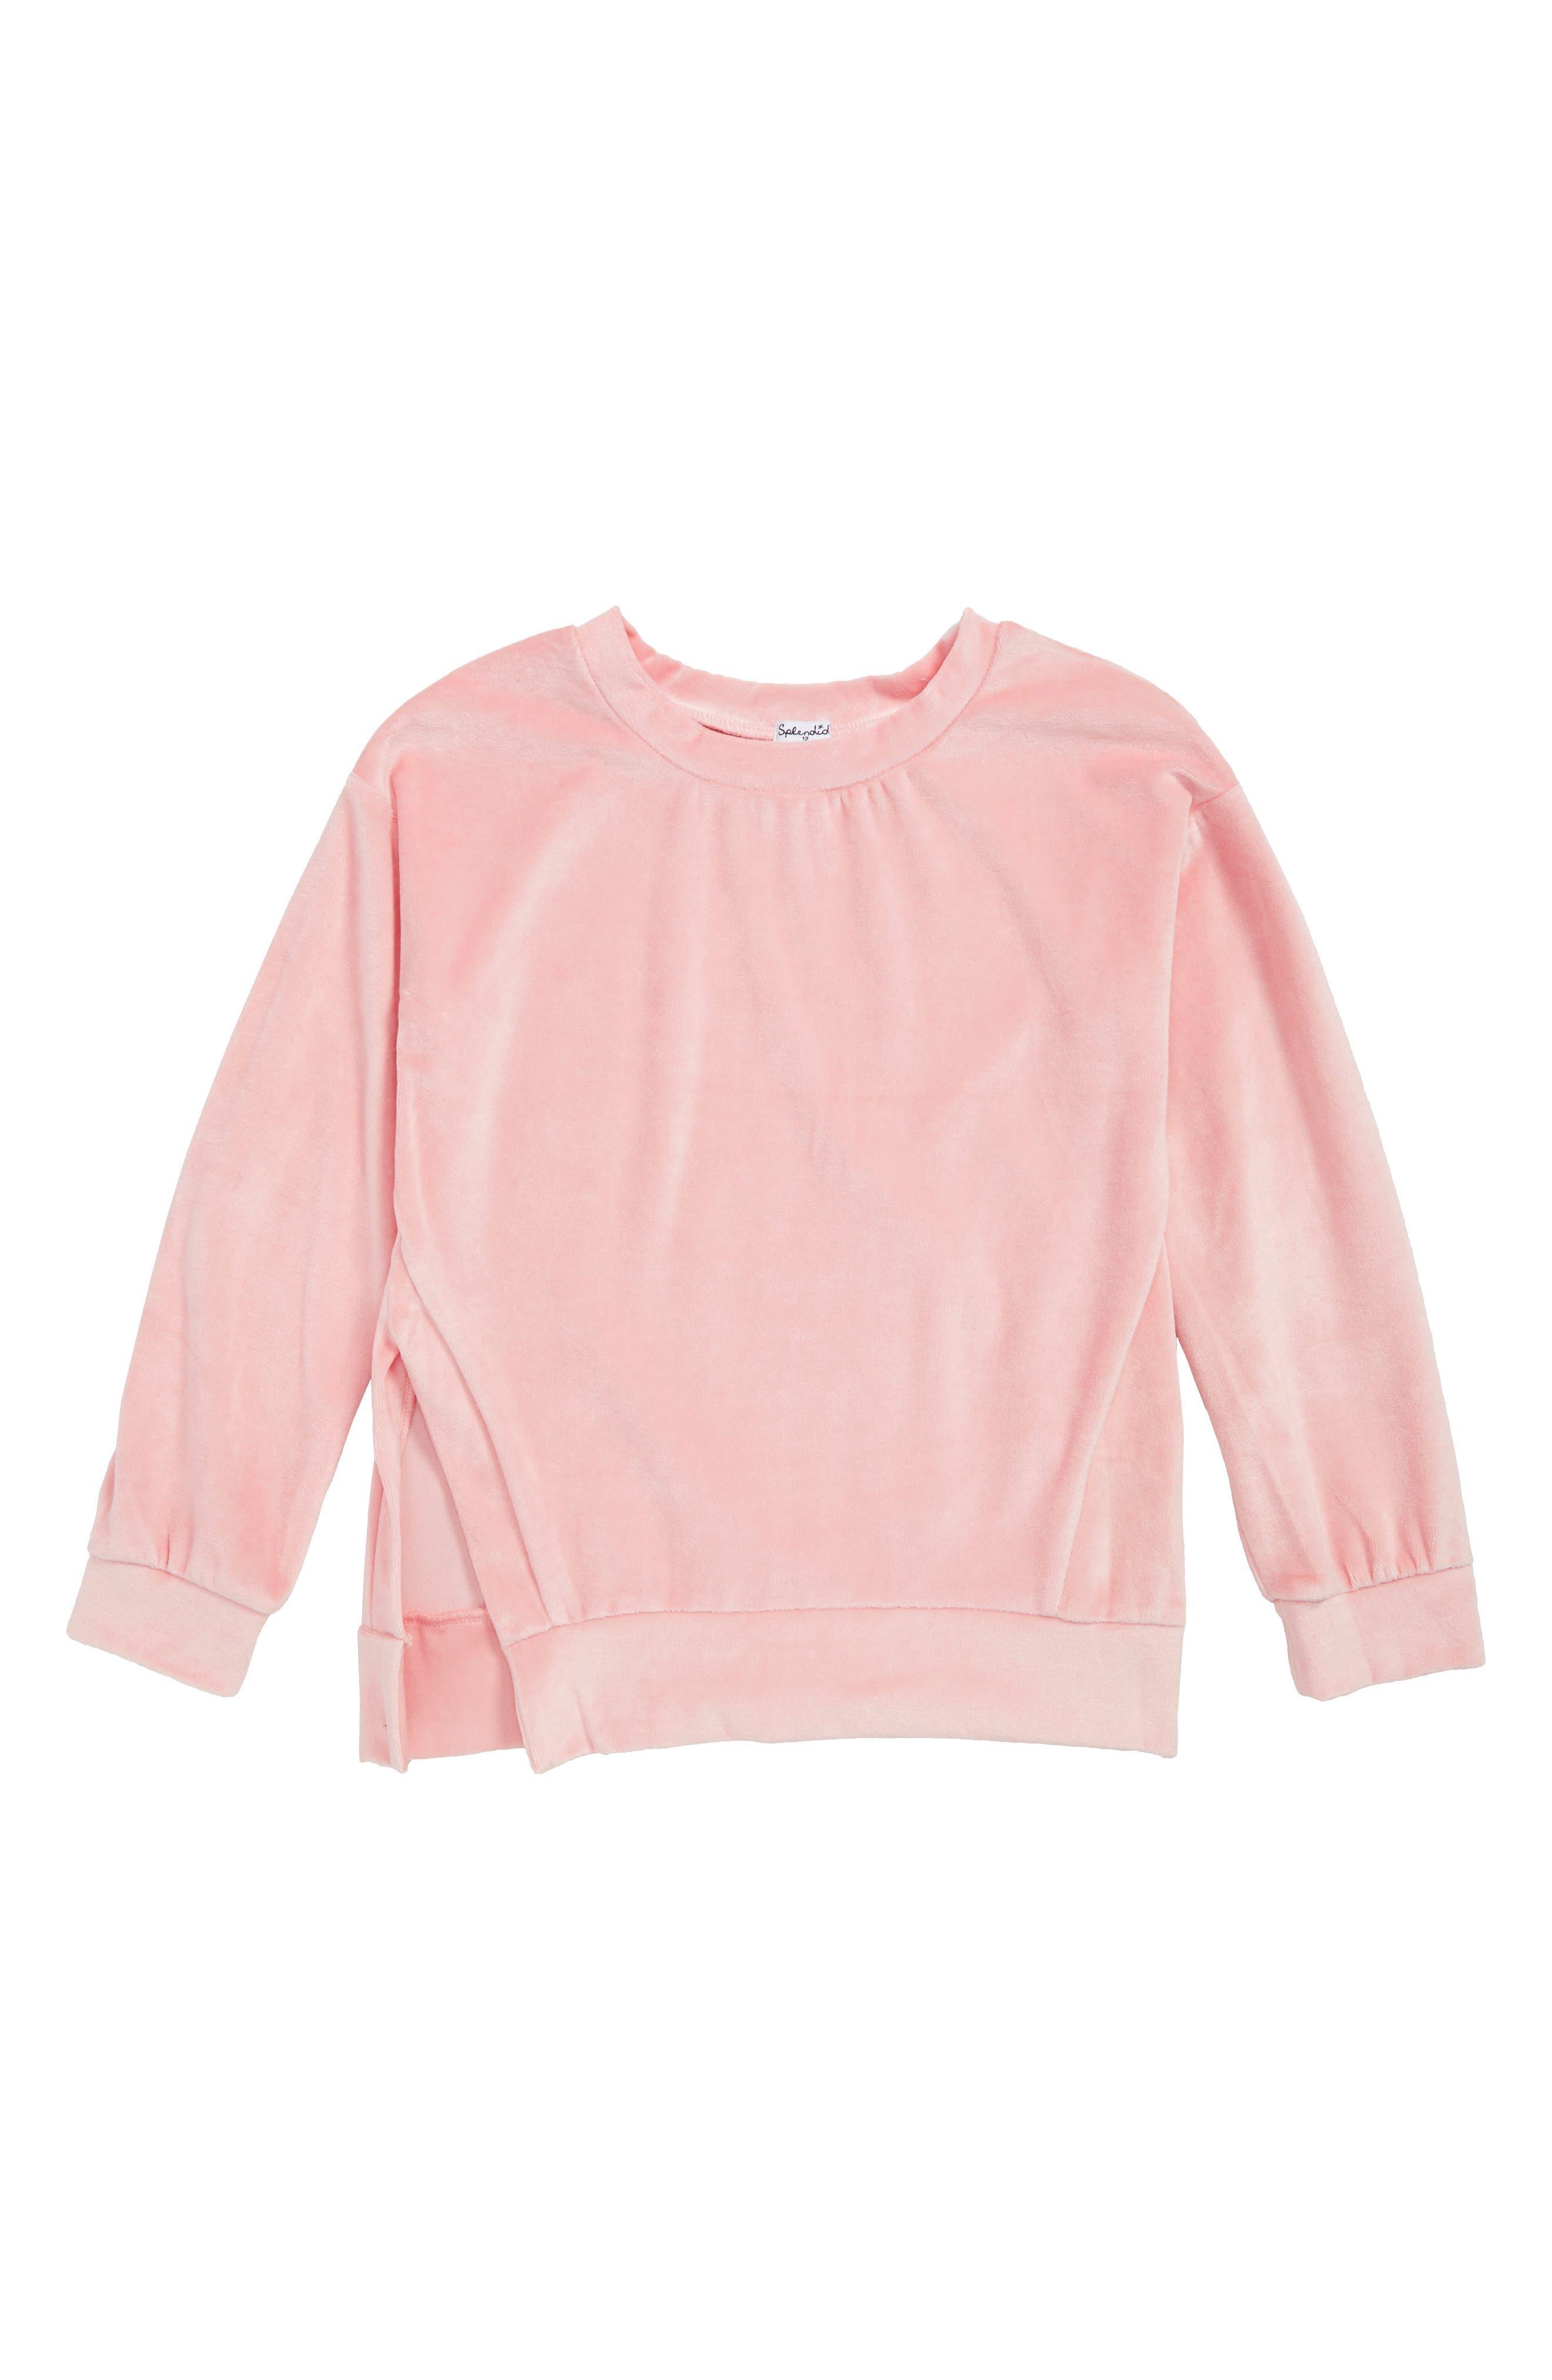 Velour Side Slit Sweatshirt,                             Main thumbnail 1, color,                             630